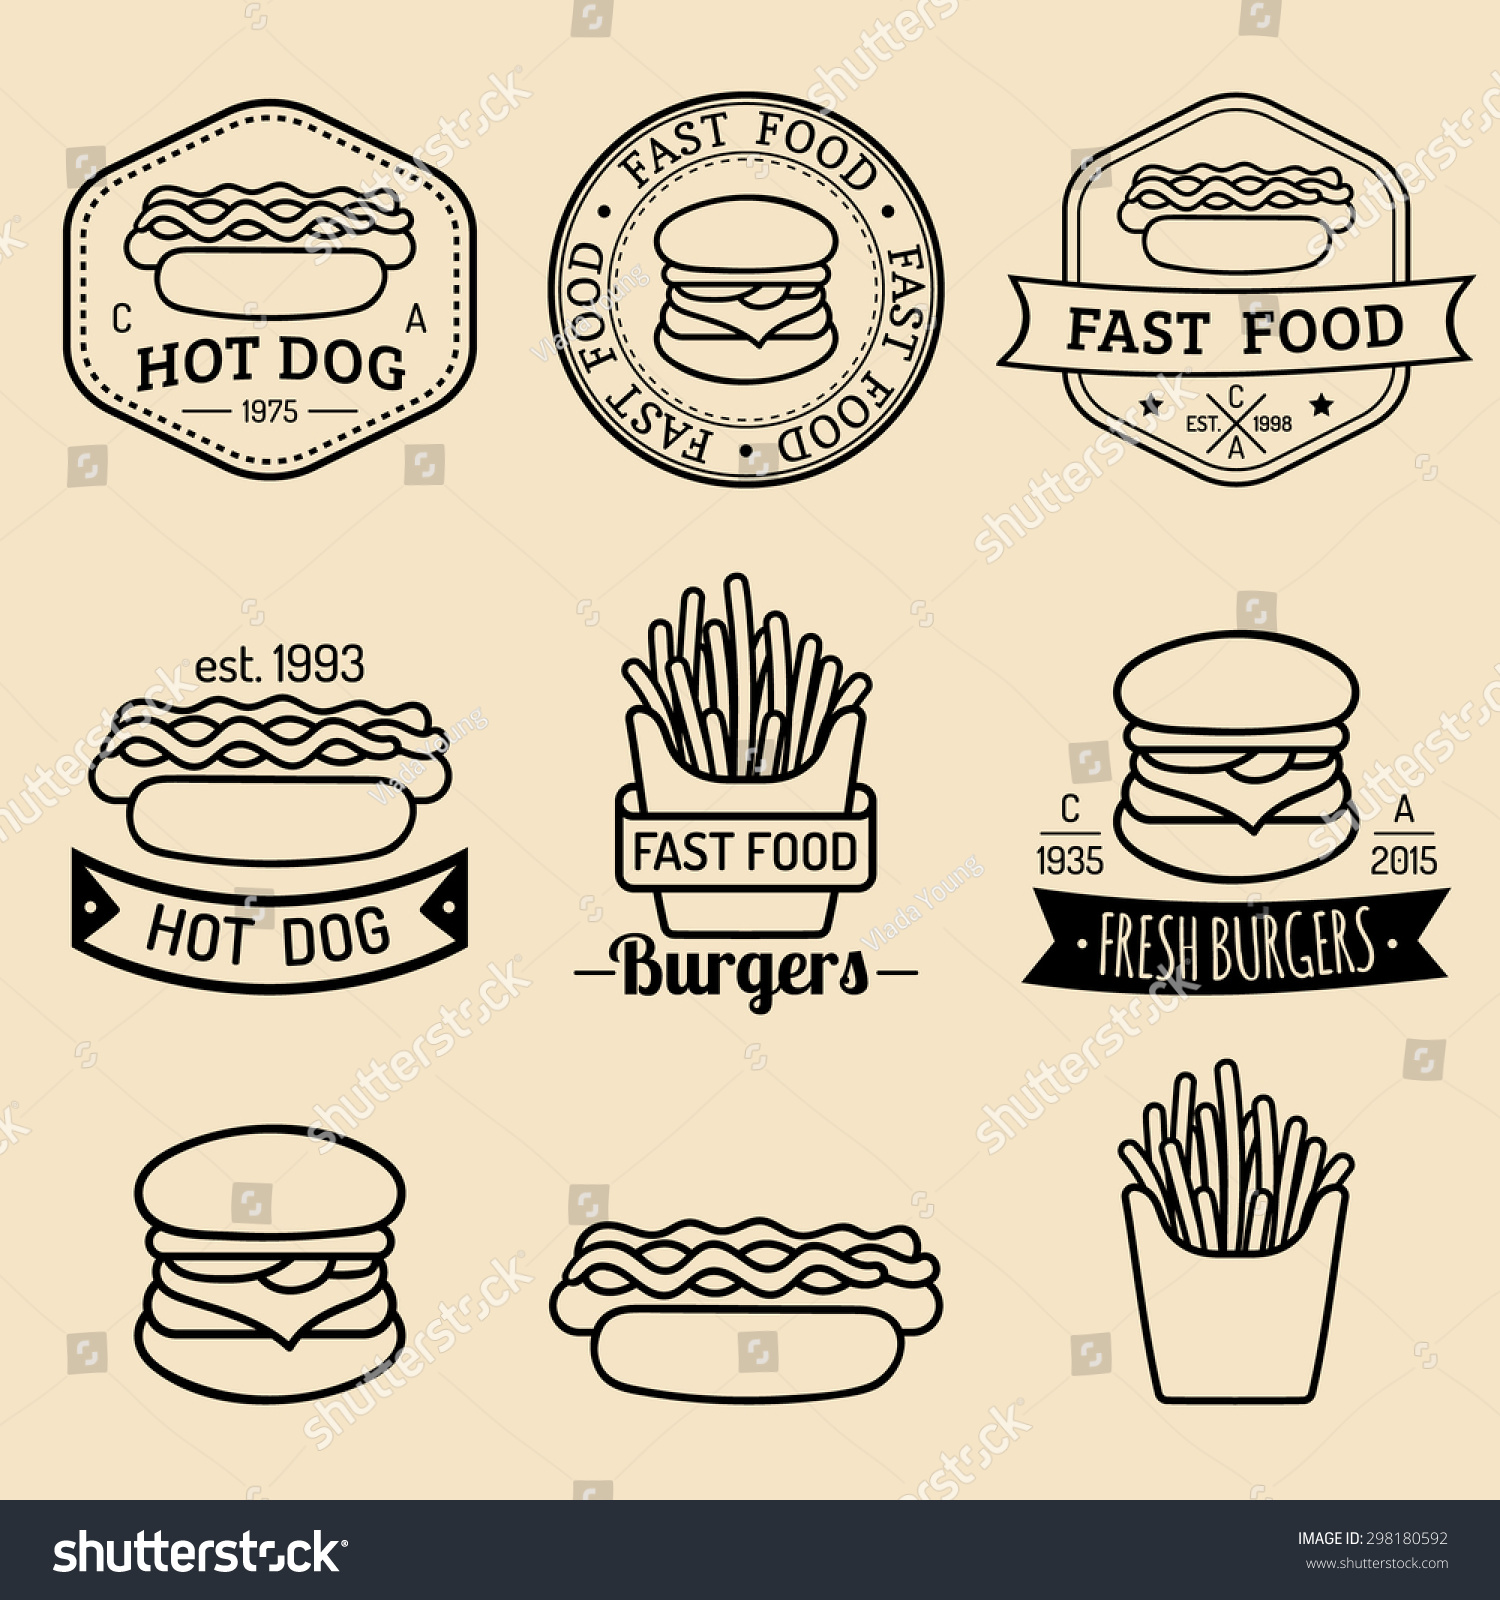 Vector Vintage Fast Food Logos Set Stock Vector (Royalty Free ...